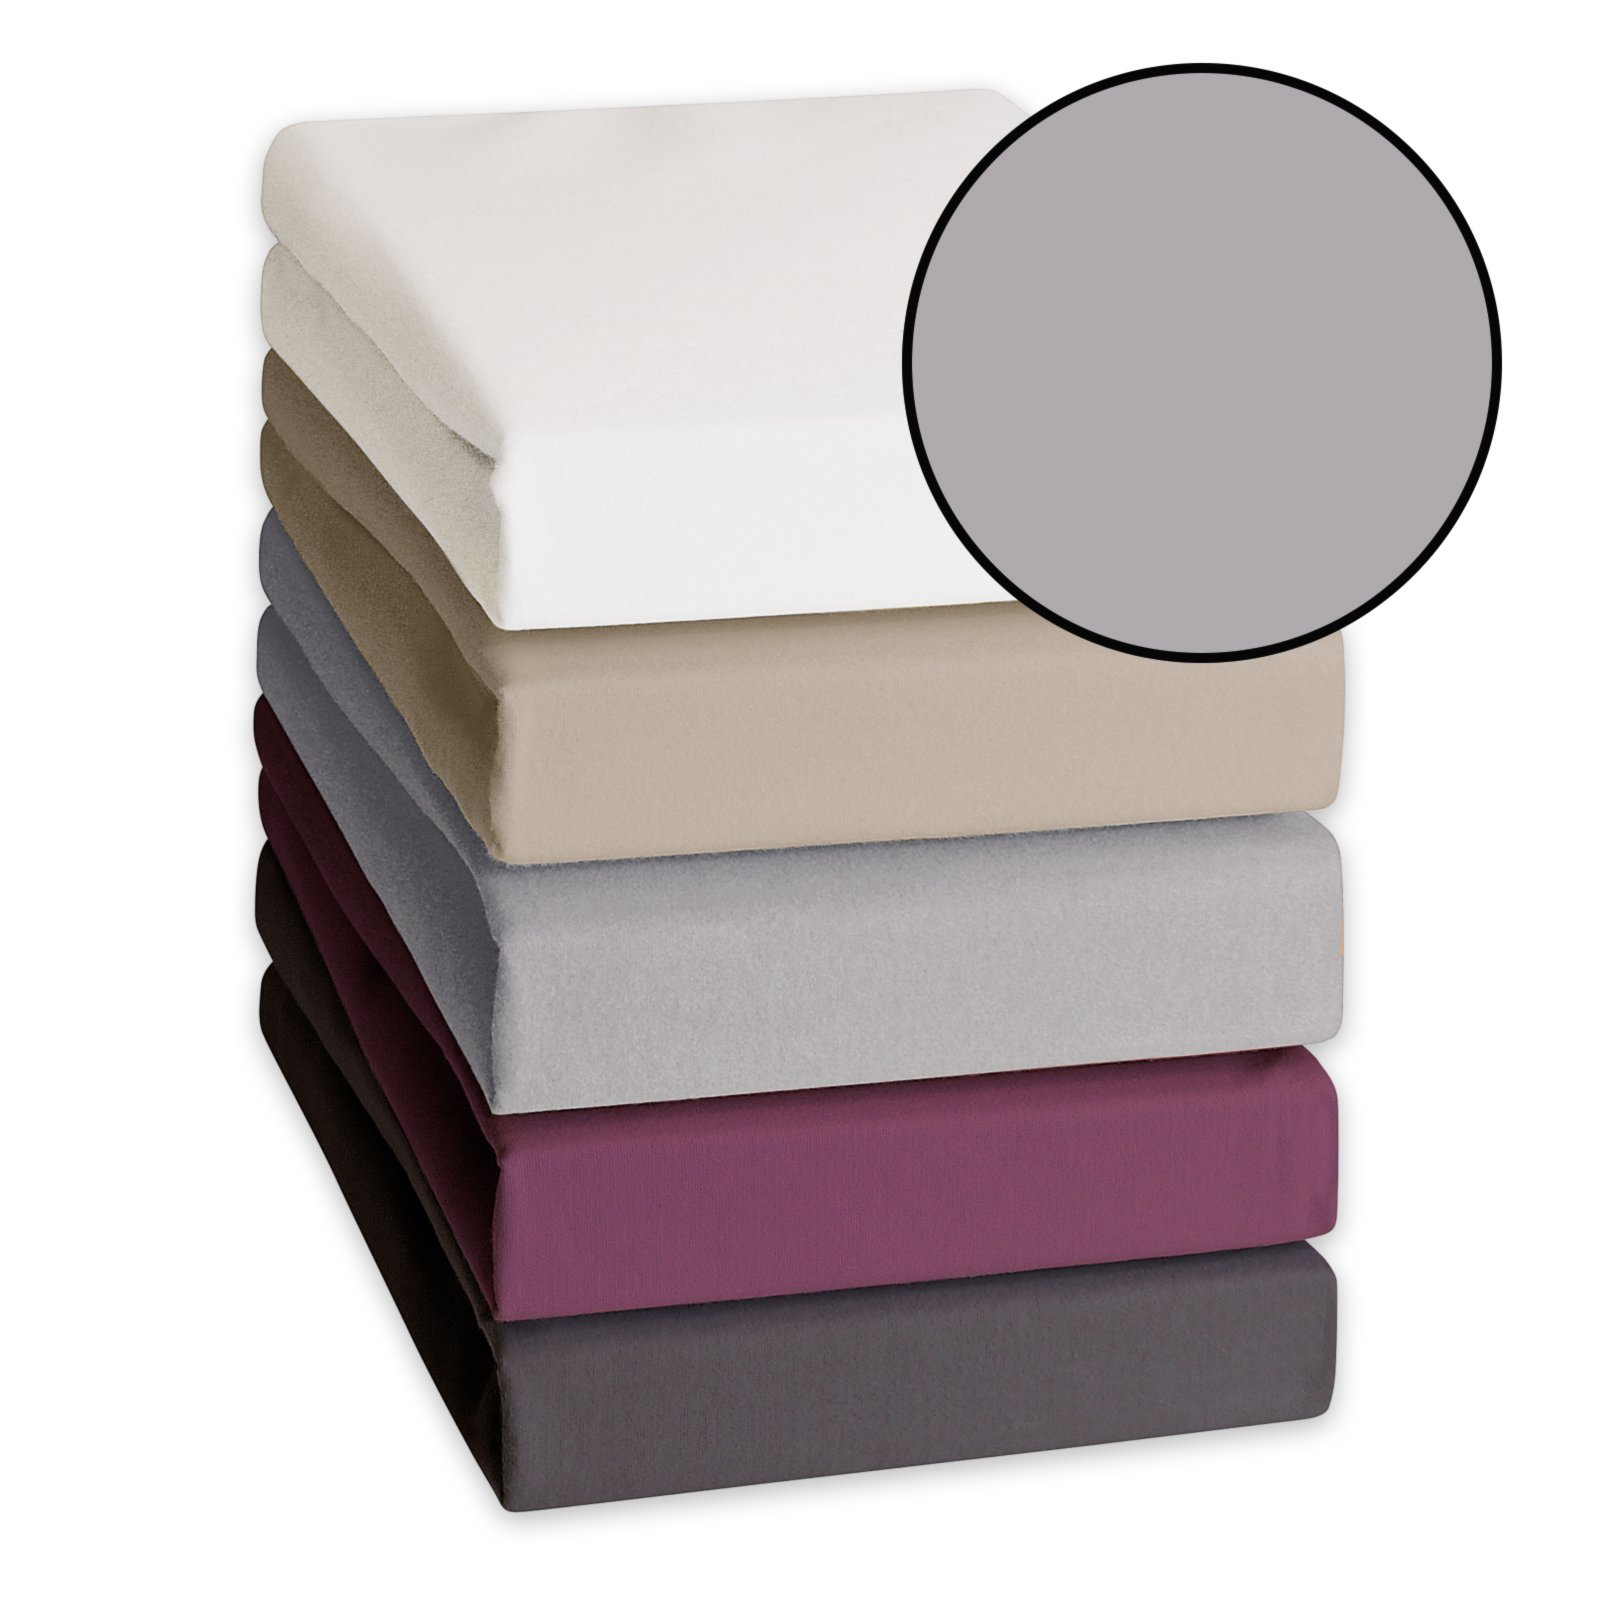 feinbiber spannbetttuch grau 140x200 cm bettlaken. Black Bedroom Furniture Sets. Home Design Ideas